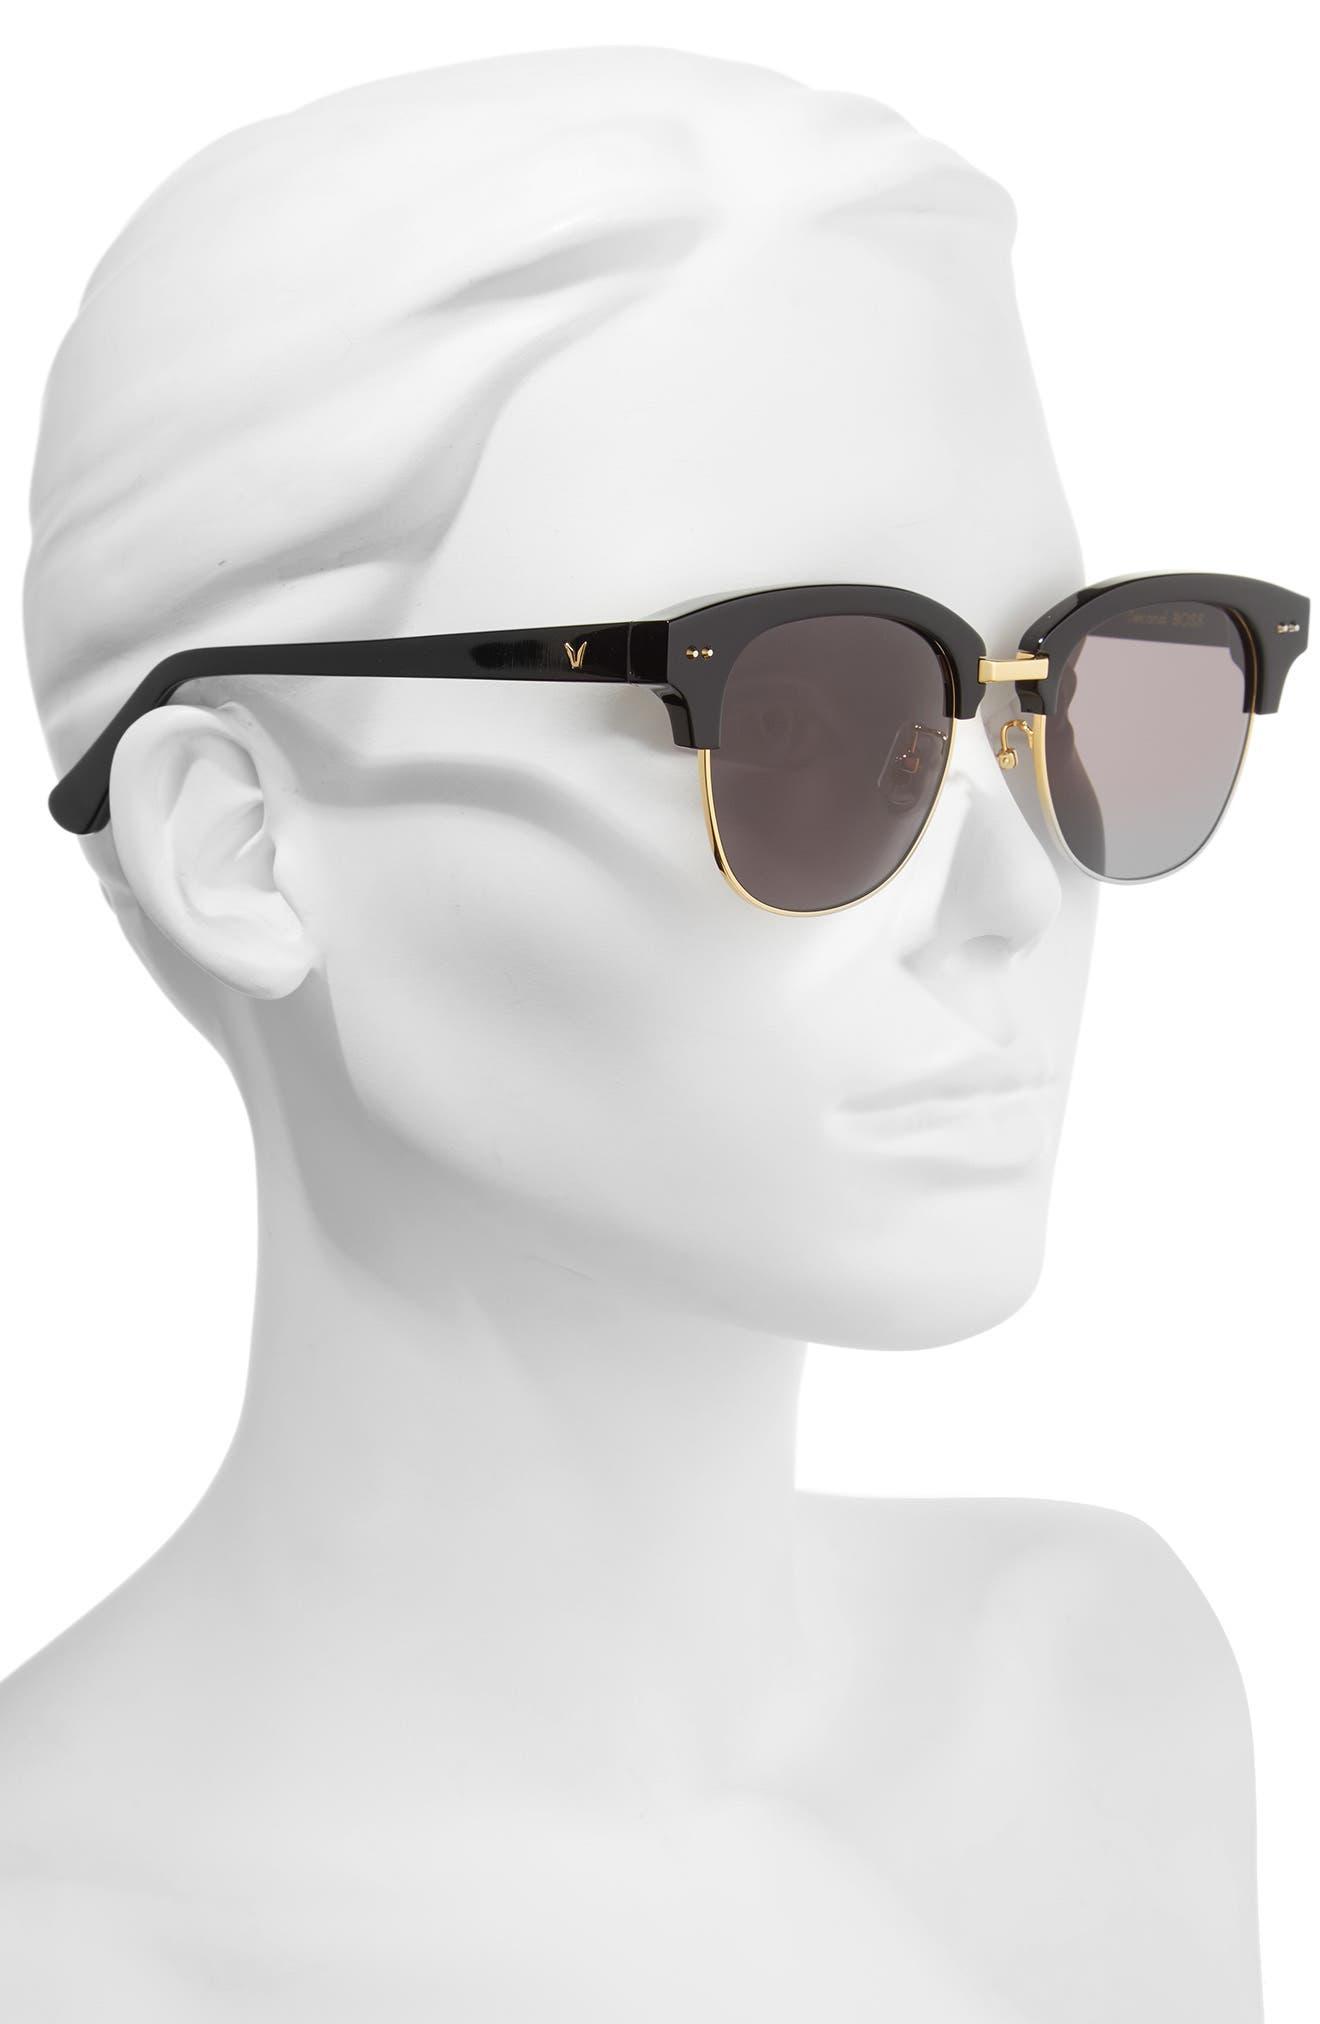 GENTLE MONSTER,                             Second Boss 51mm Retro Sunglasses,                             Alternate thumbnail 2, color,                             001